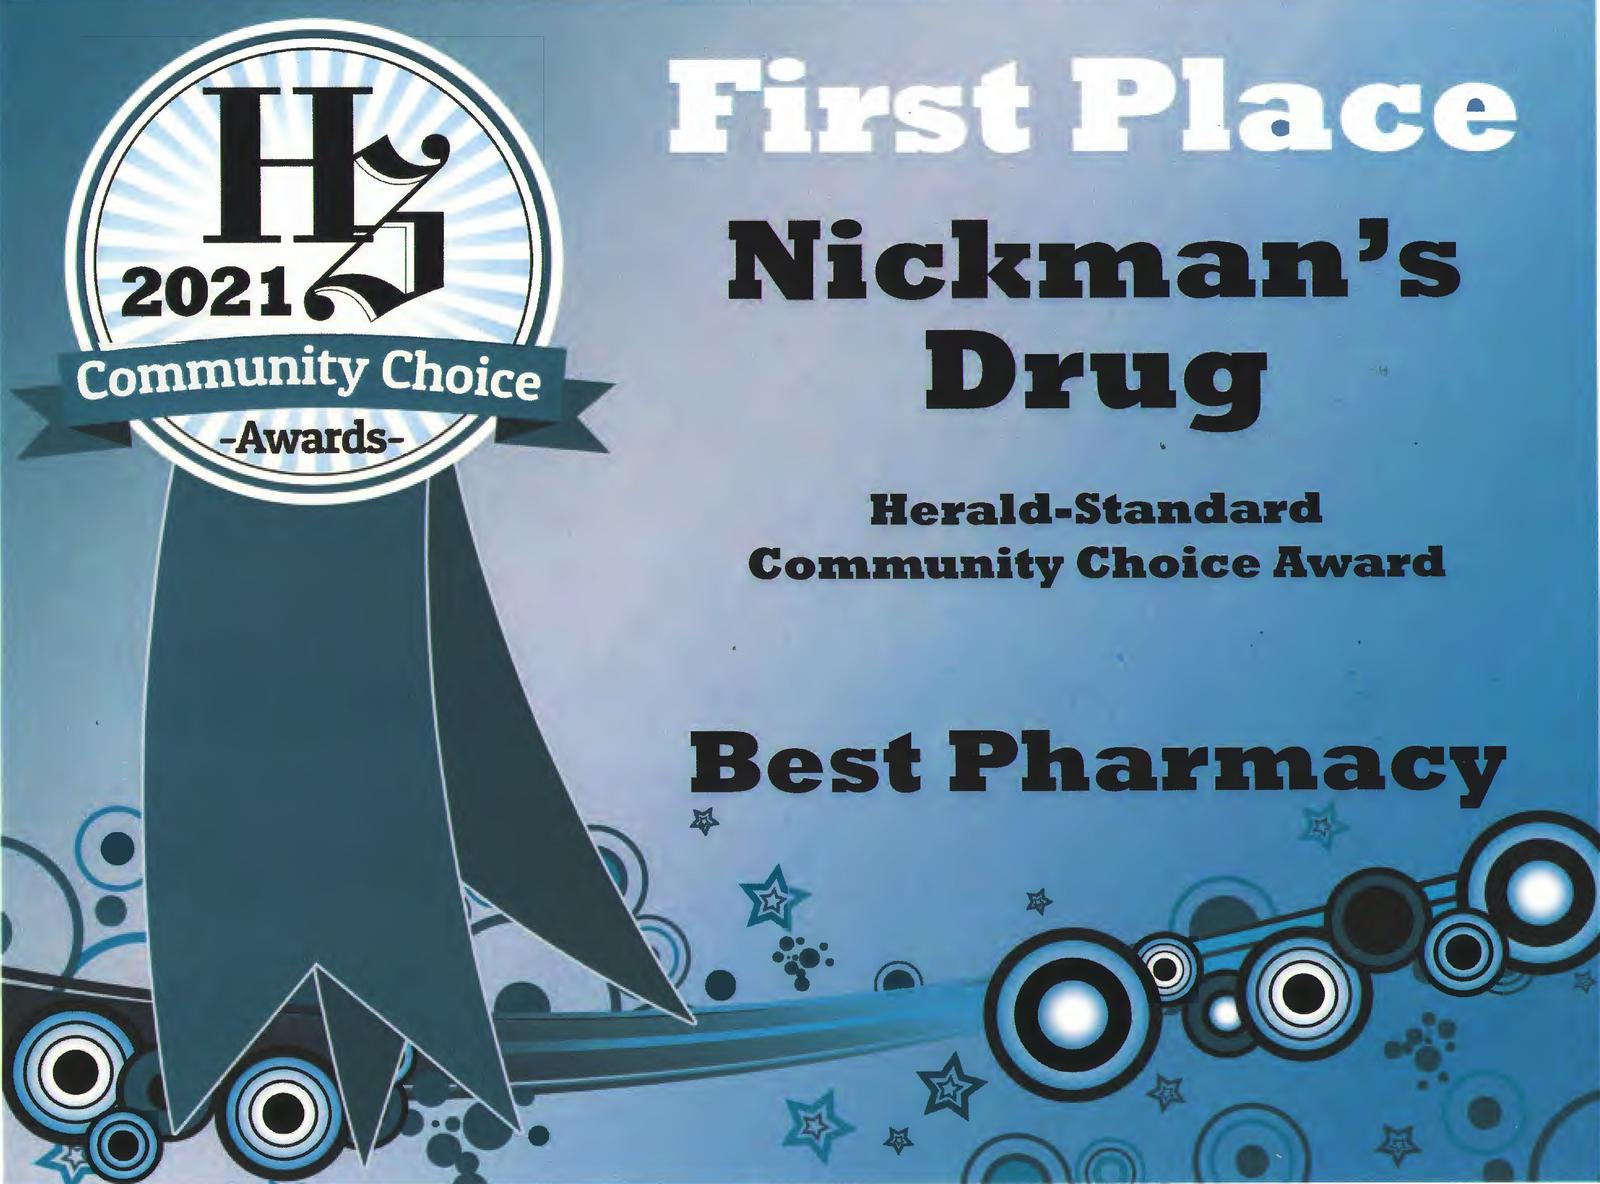 NICKMANS_2021 COMMUNITY CHOICE AWARD_BEST PHARMACY-2.png